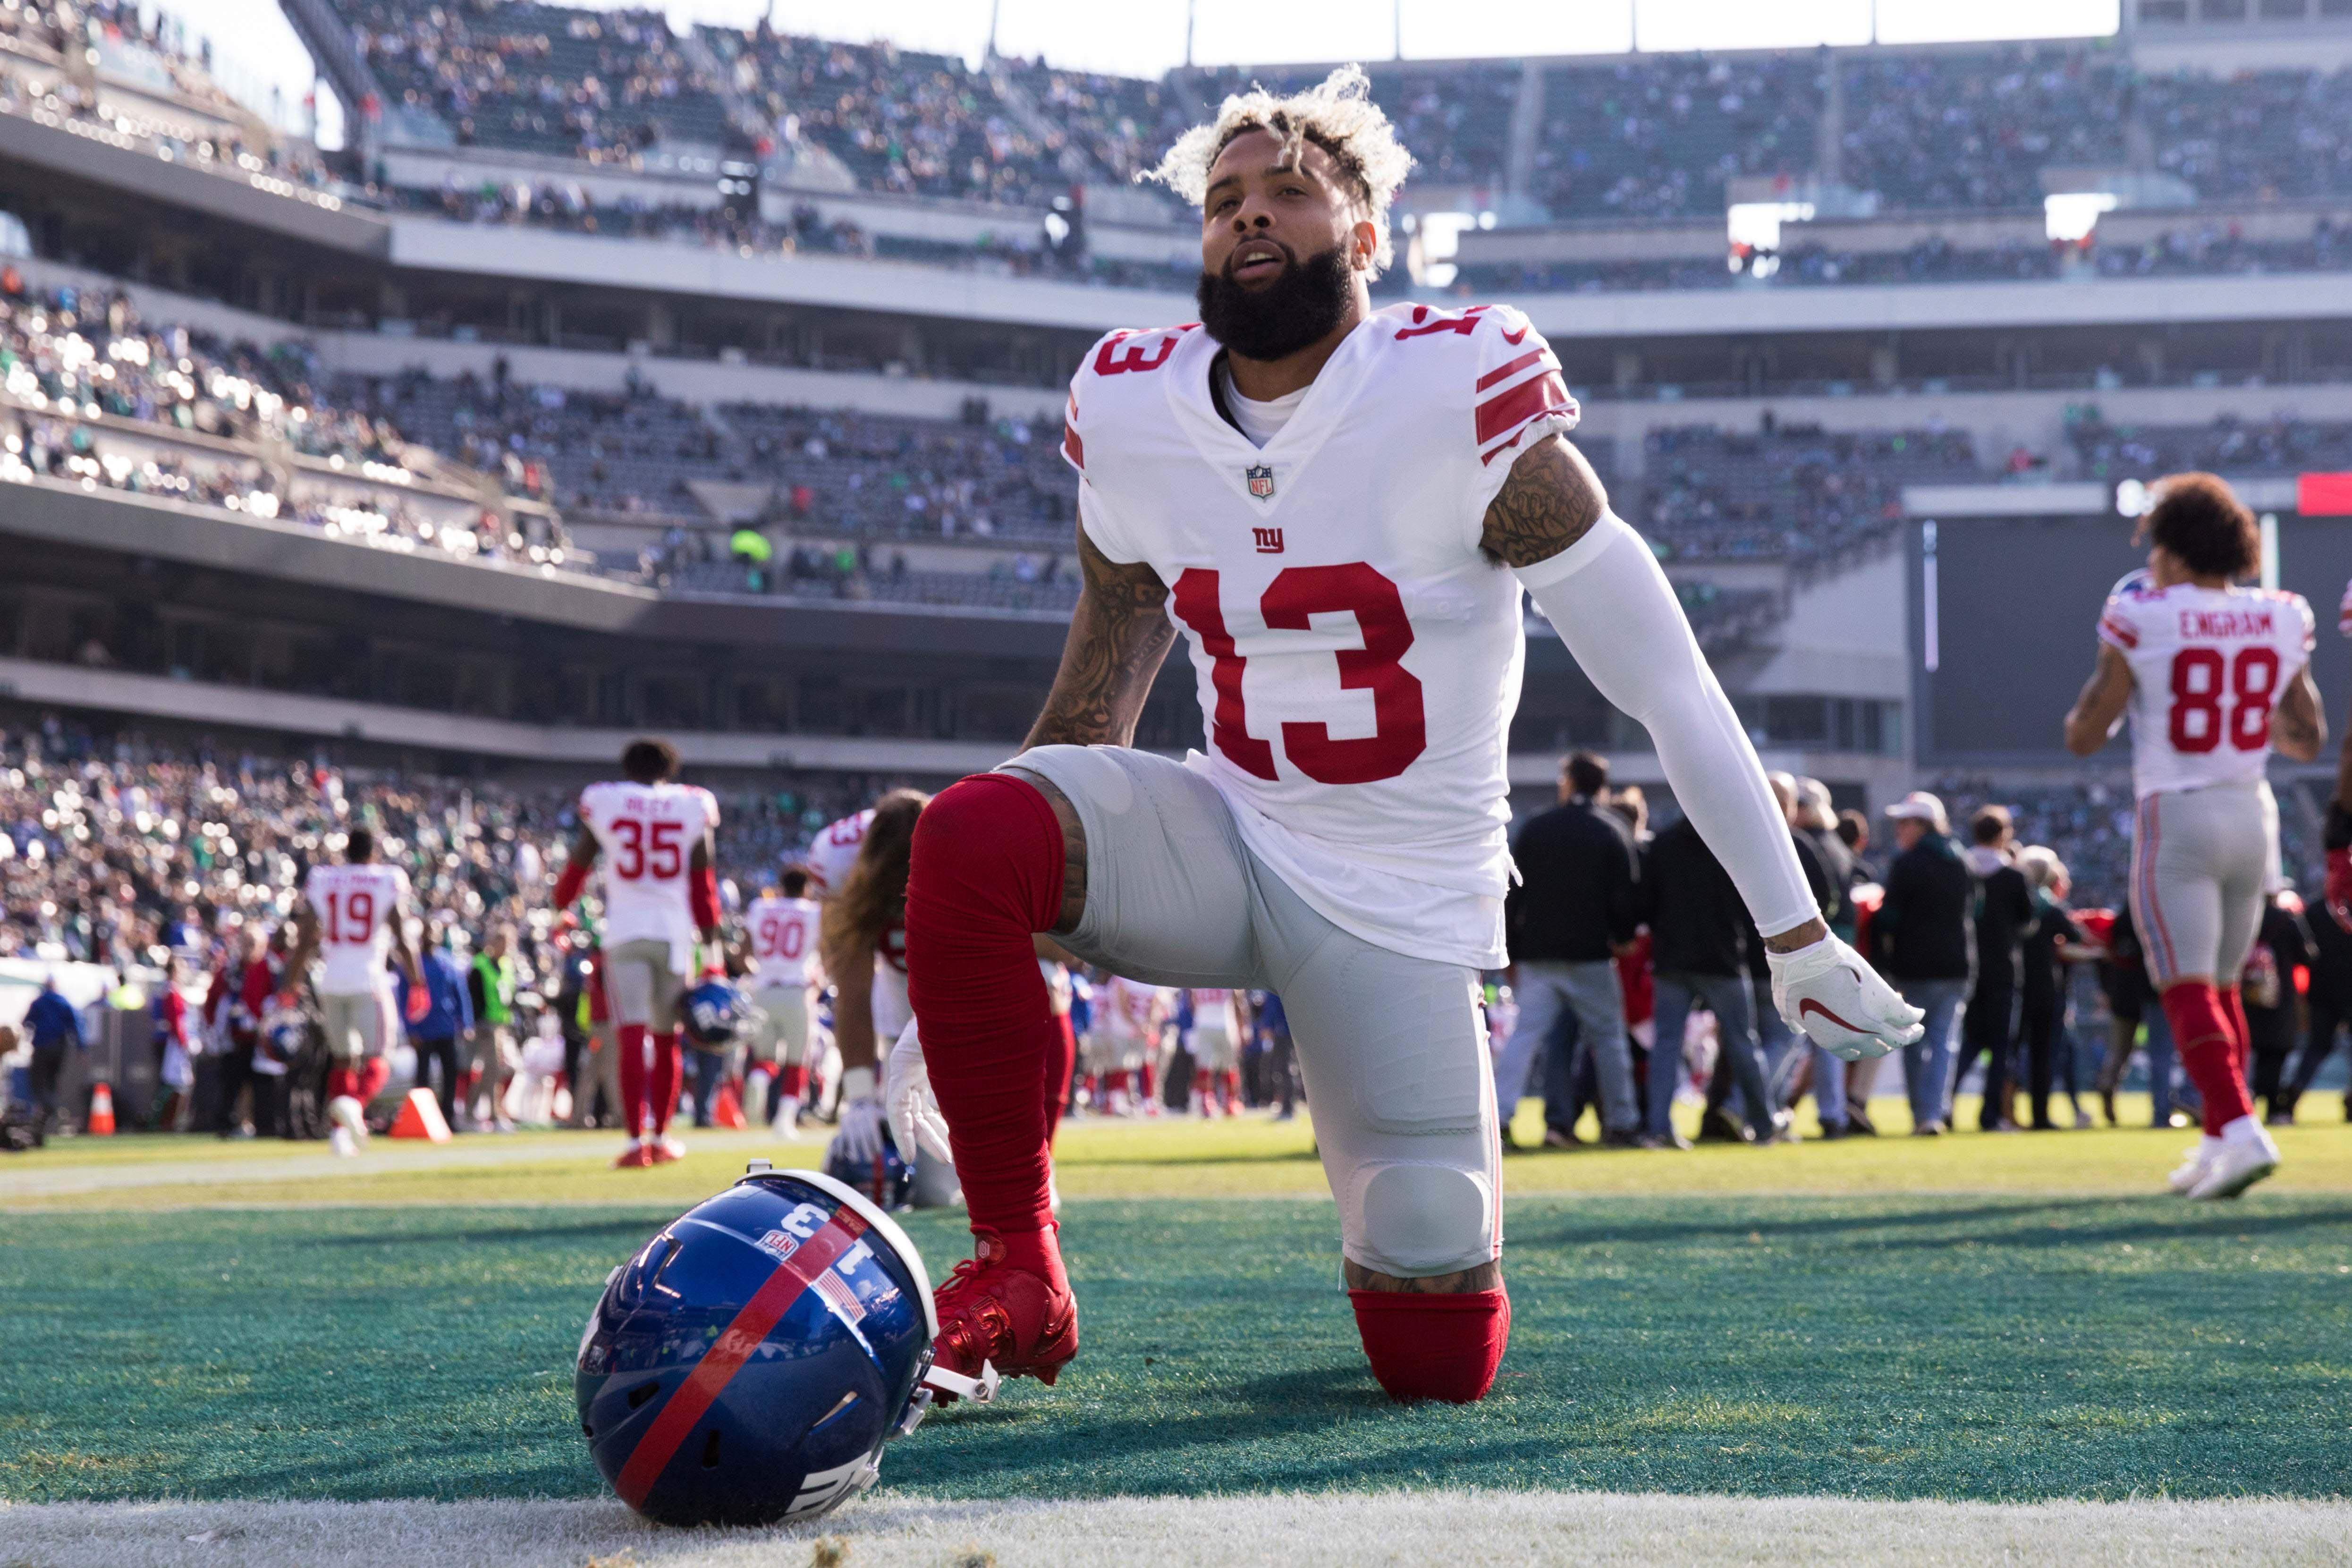 Odell Beckham Jr. Feels Sorry for his 2019 Opponents